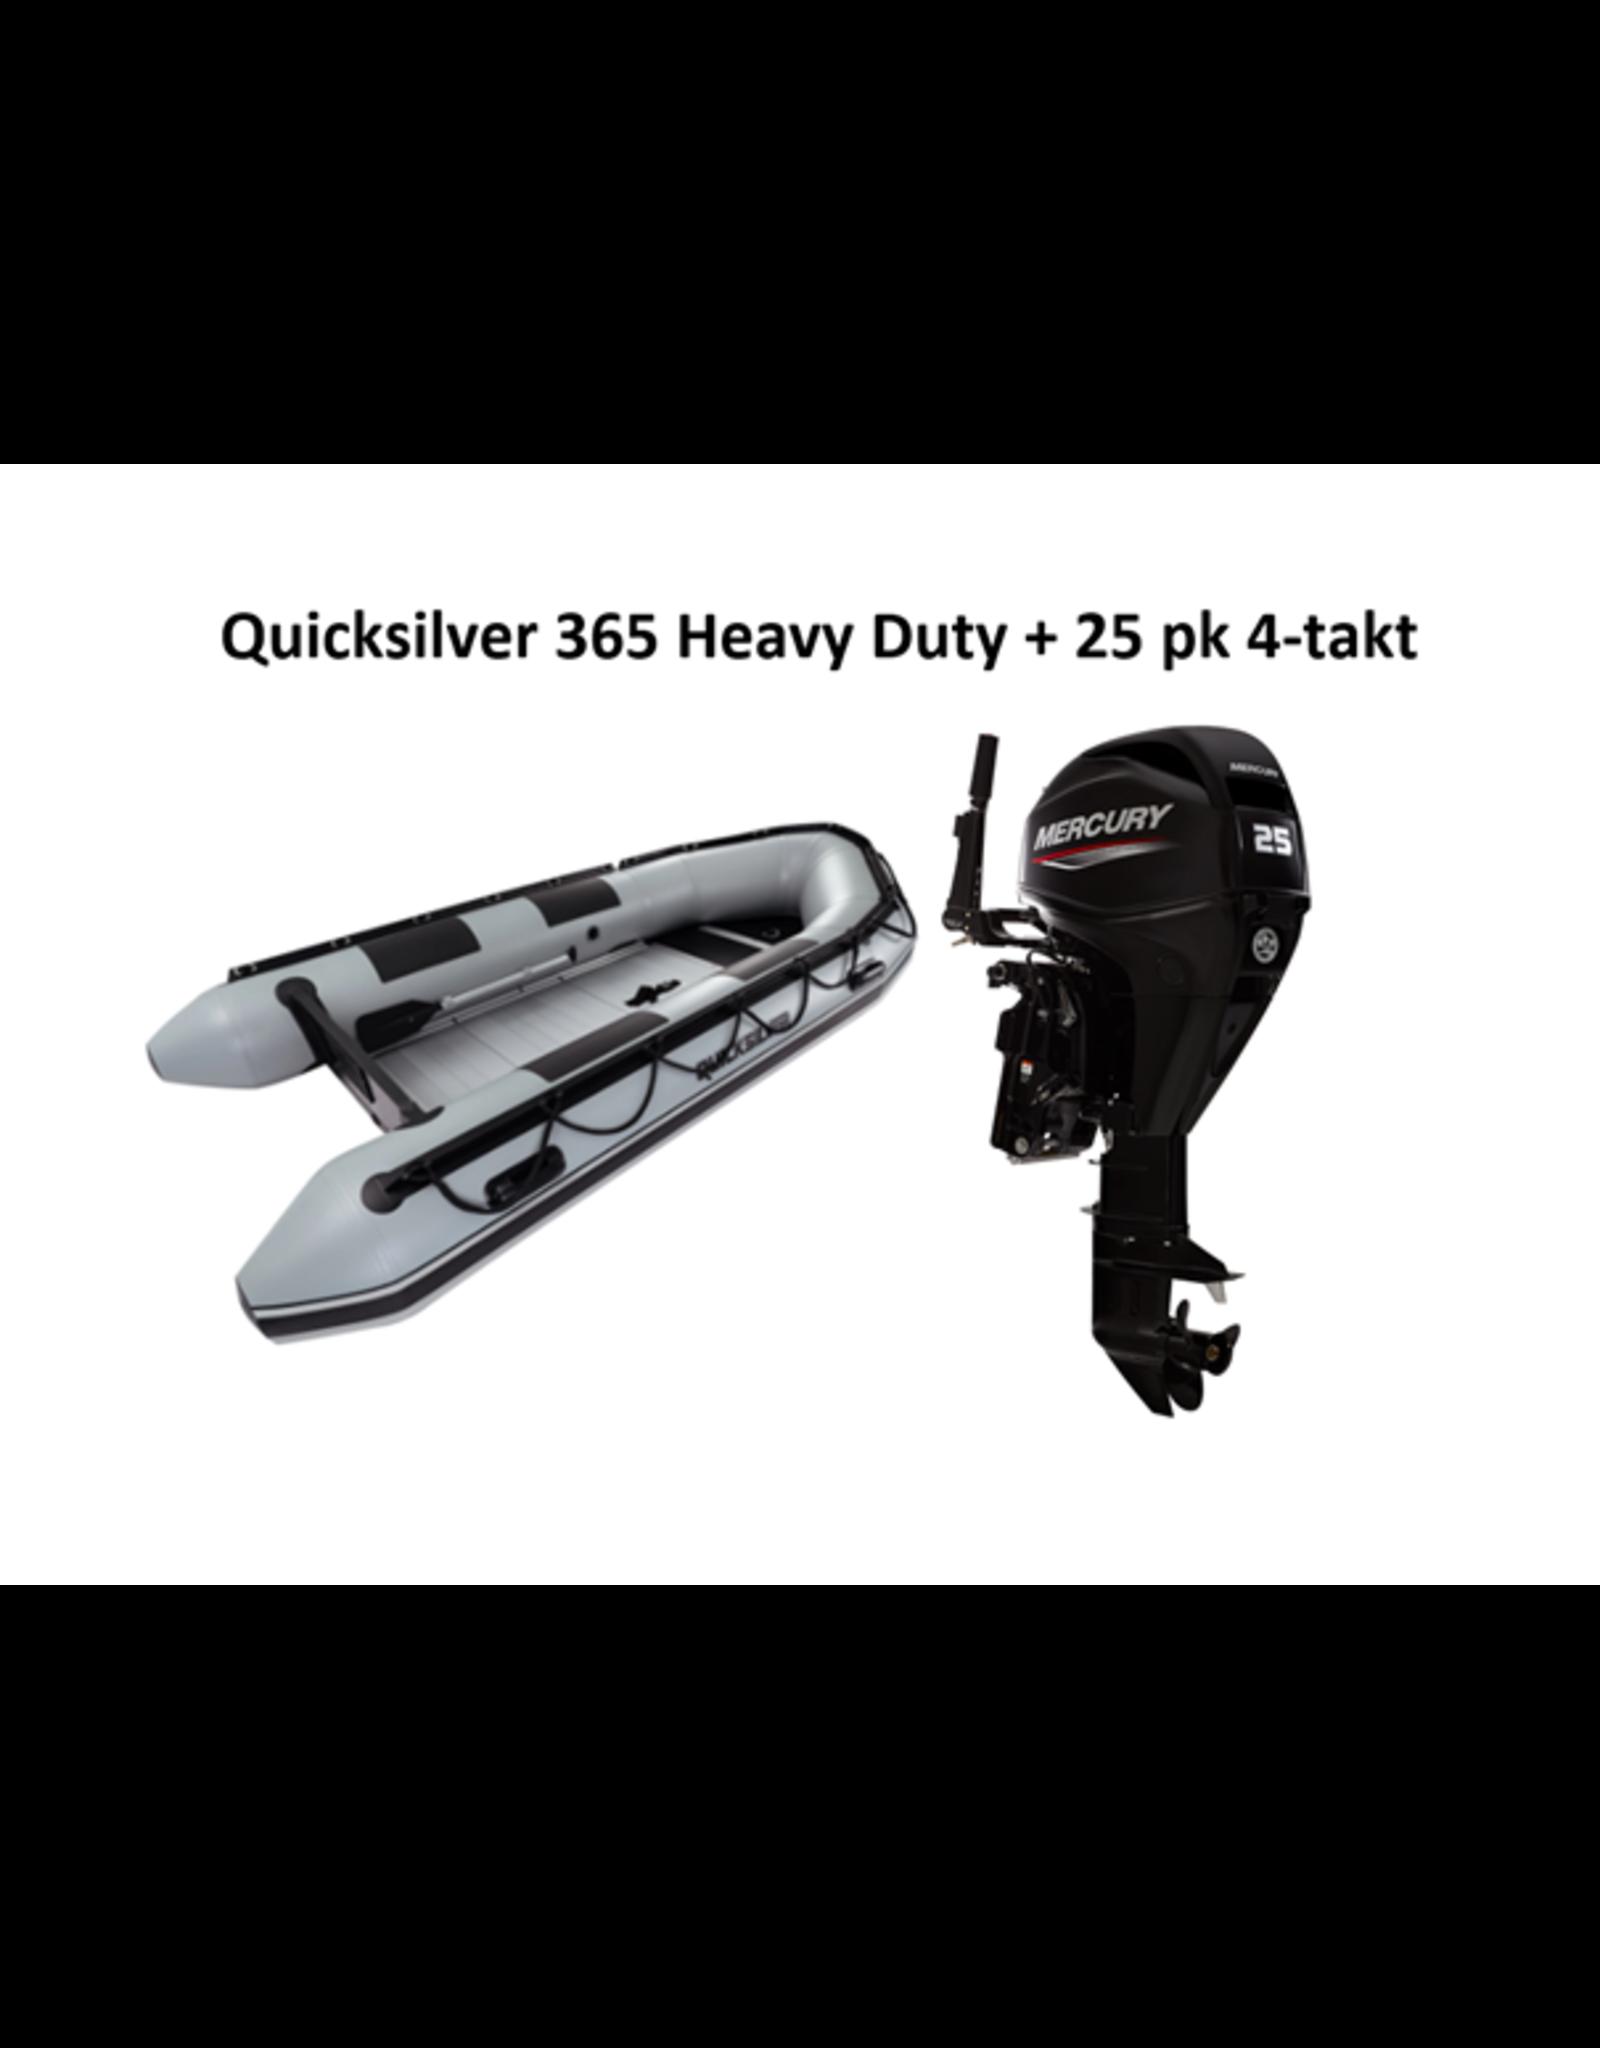 Quicksilver Quicksilver 365 Heavy Duty + Mercury 6/25 pk 4-takt